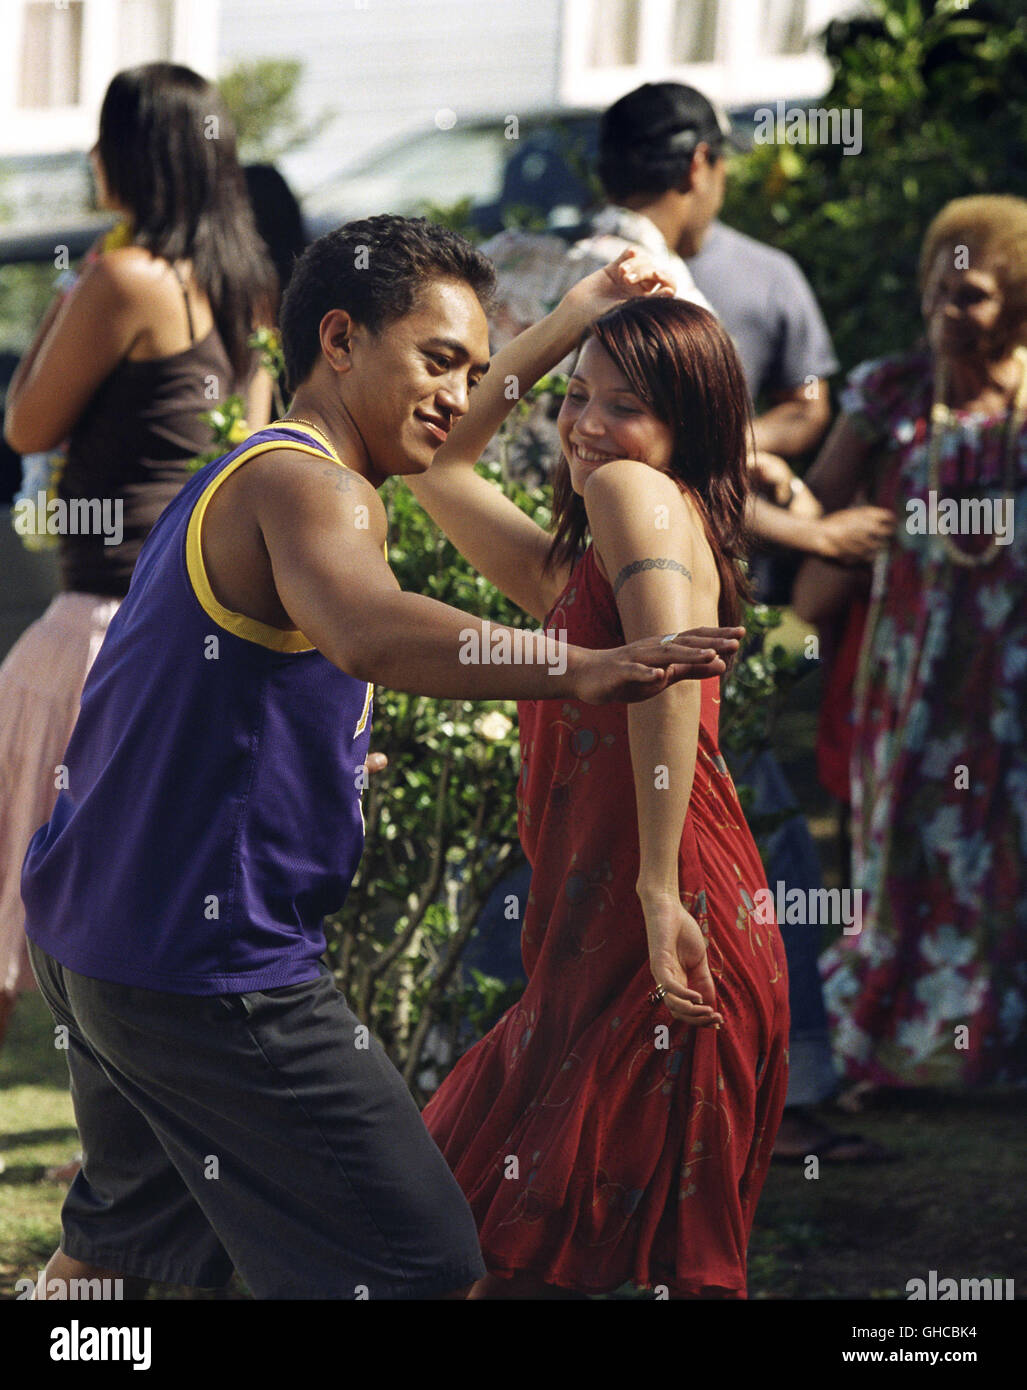 NO. 2 New Zealand 2005 Toa Fraser The dancing couple Soul (TAUNGAROA EMILE) and Danish Maria (TUVA NOVOTNY) Regie: - Stock Image